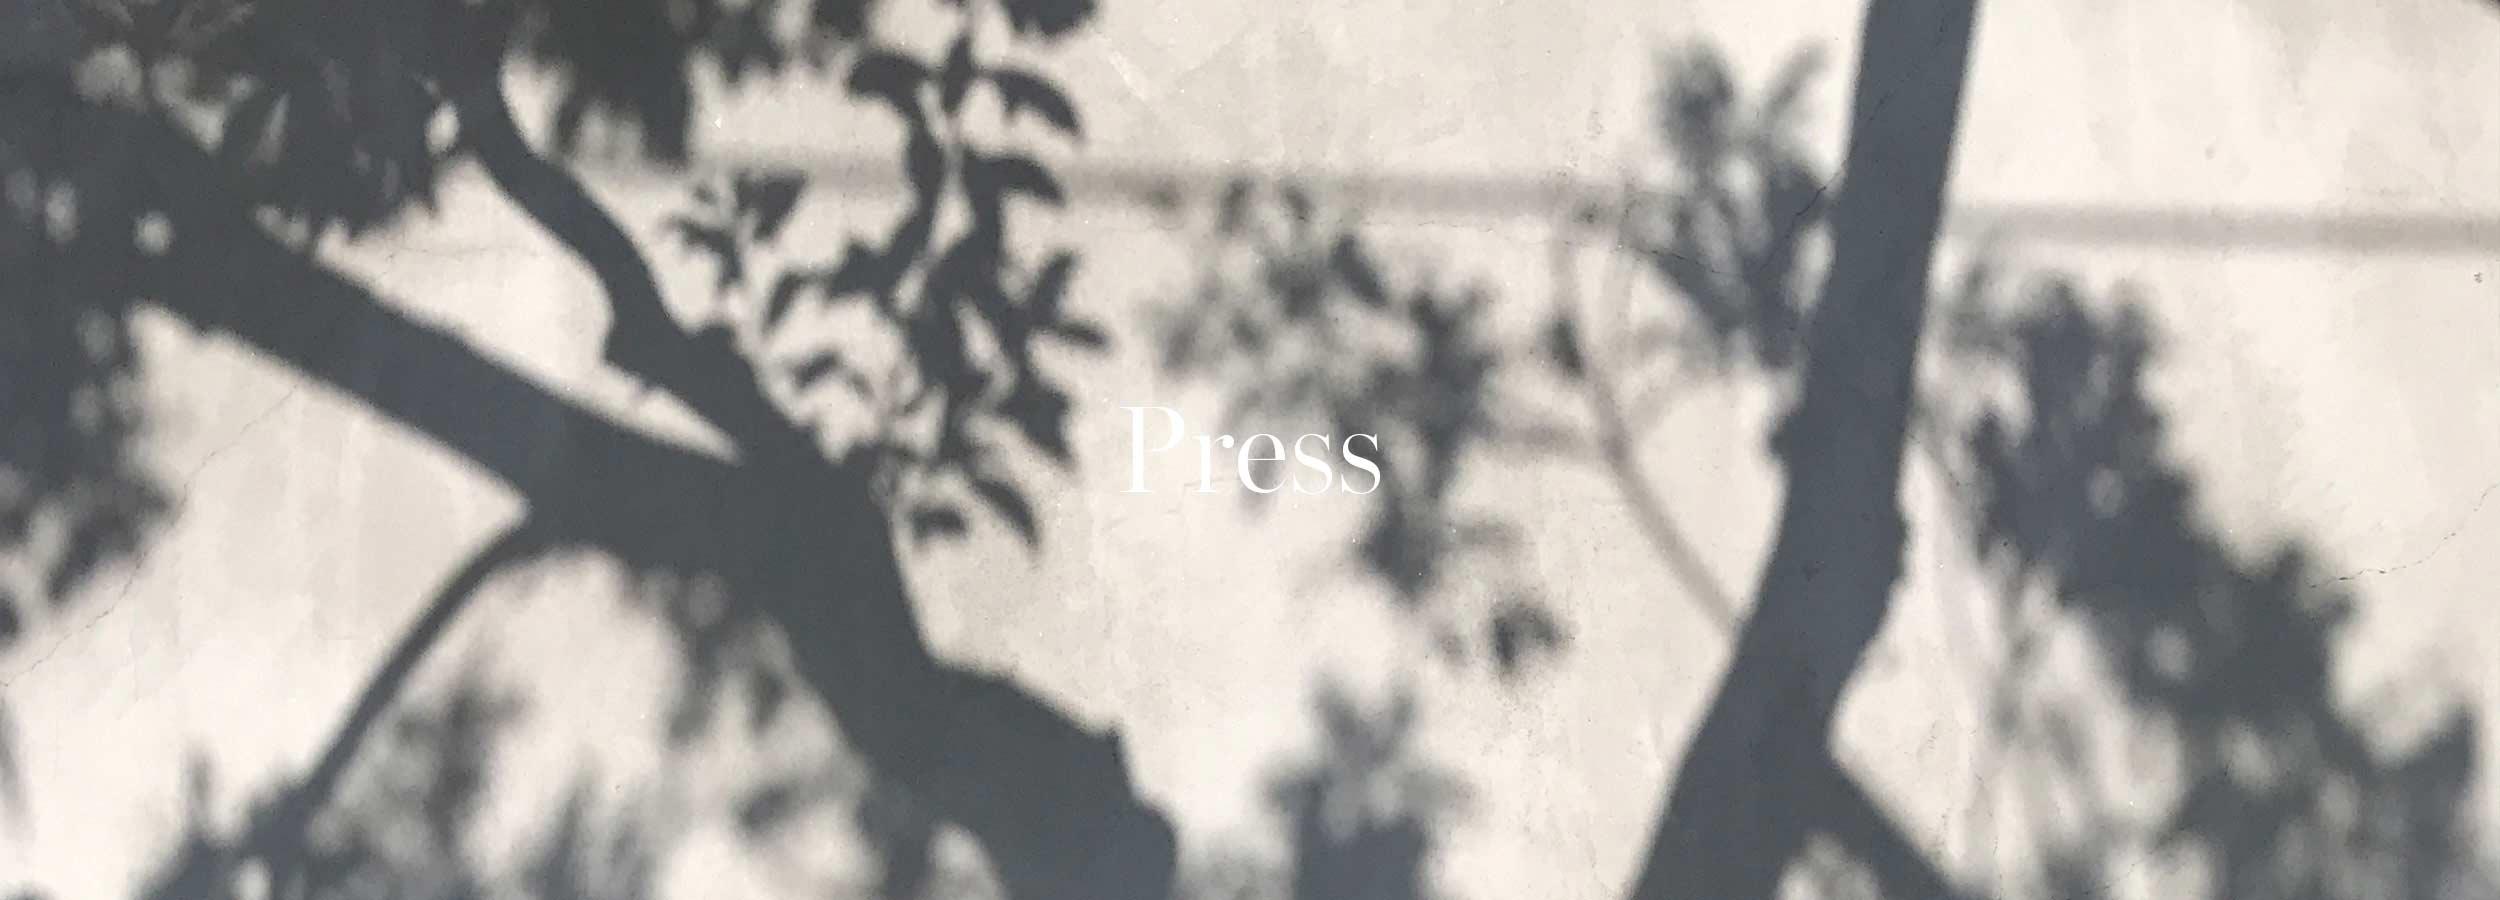 •Press.jpg